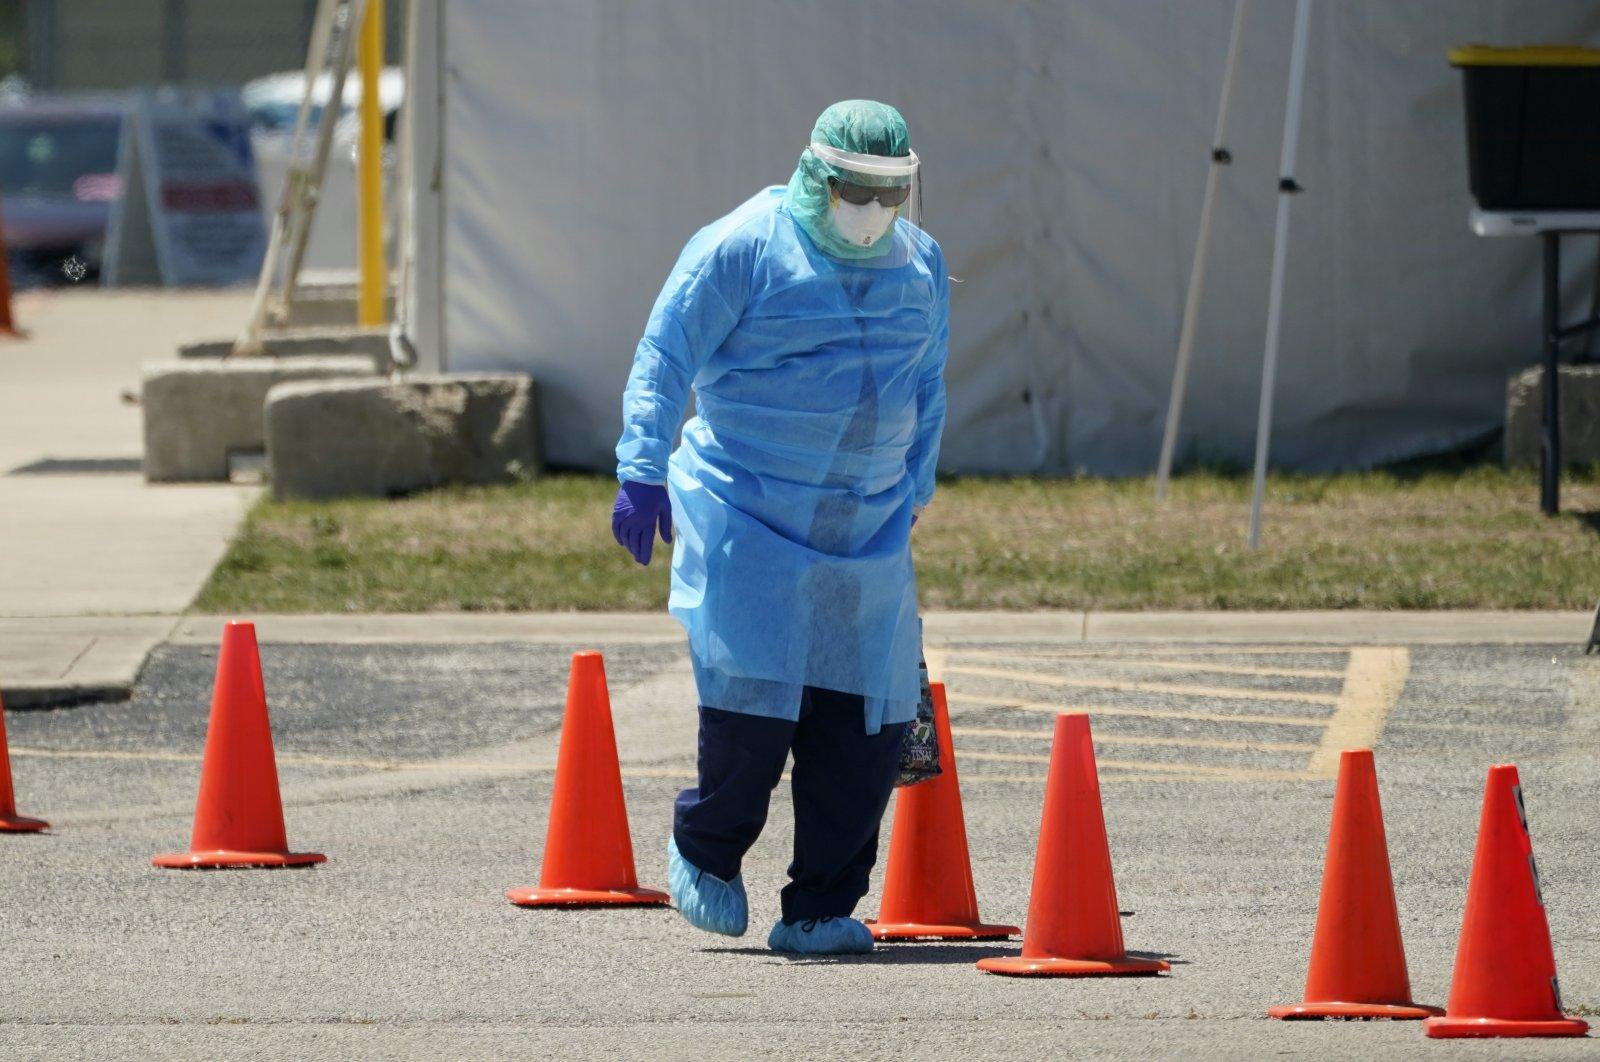 Medical personnel prepare a drive-thru COVID-19 testing site, San Antonio, Texas, Aug. 14, 2020. (AP Photo)